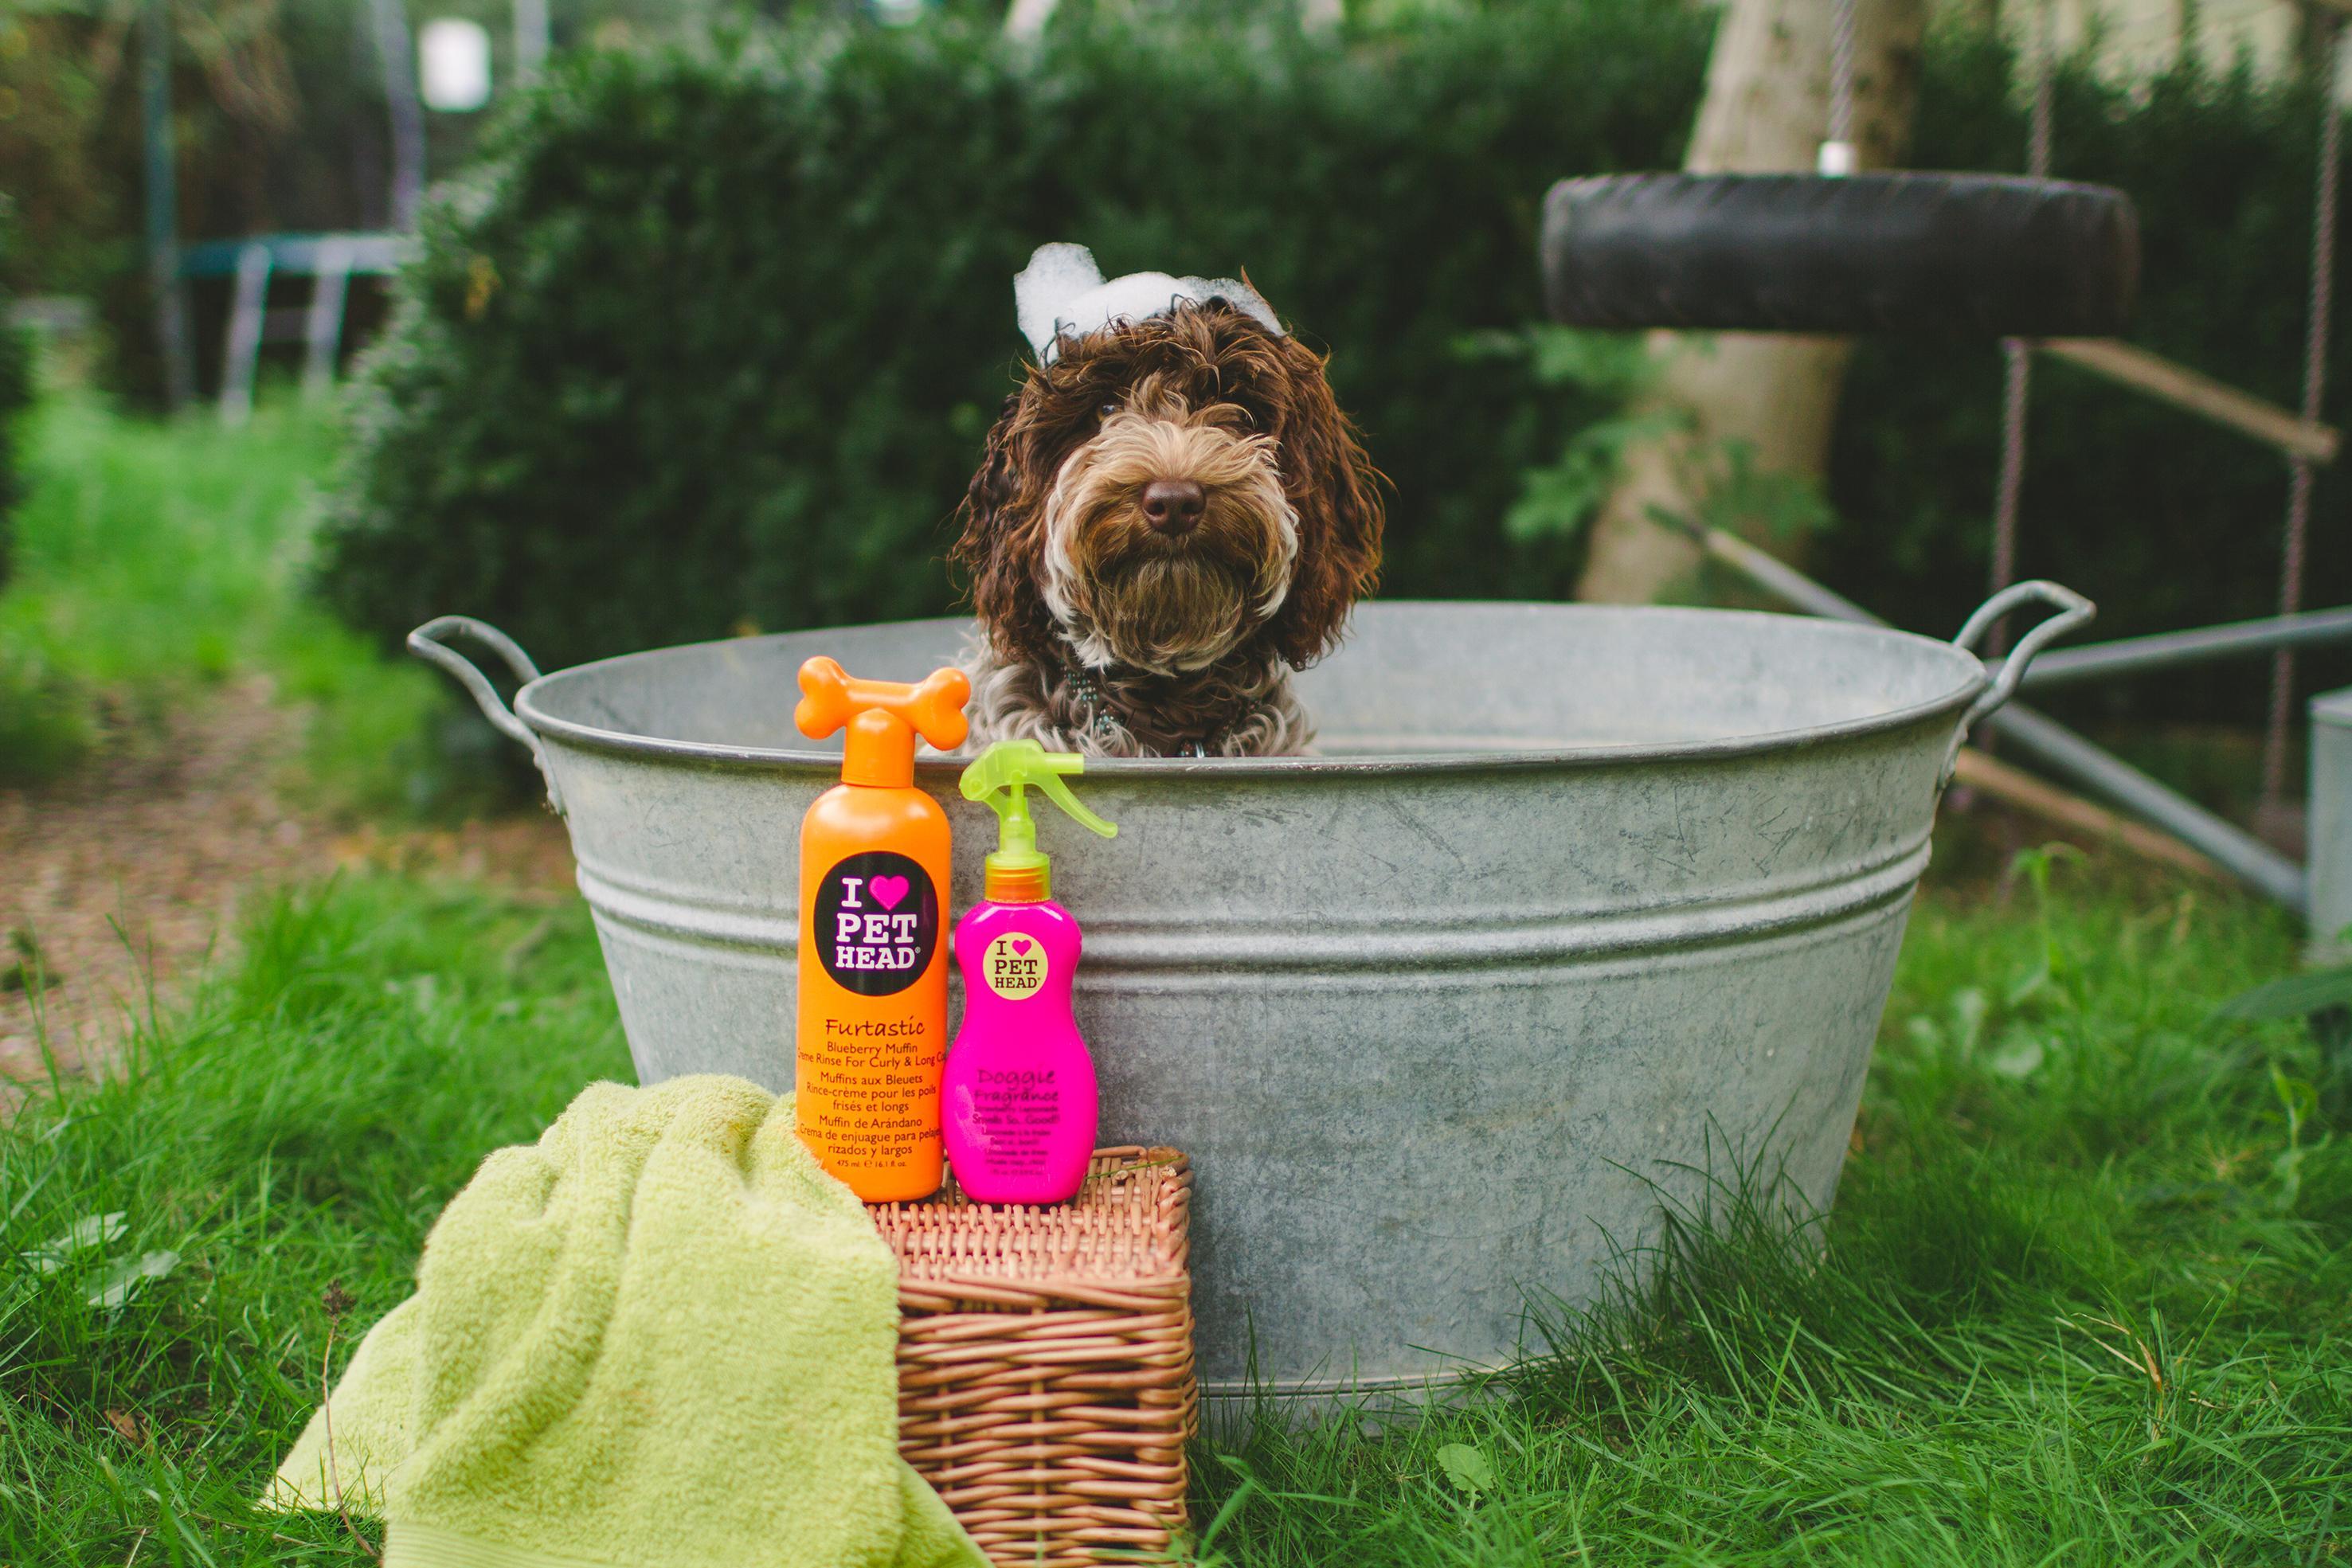 Amazon.com: Pet Head Dirty Talk Deodorizing Shampoo 16.1oz: Pet